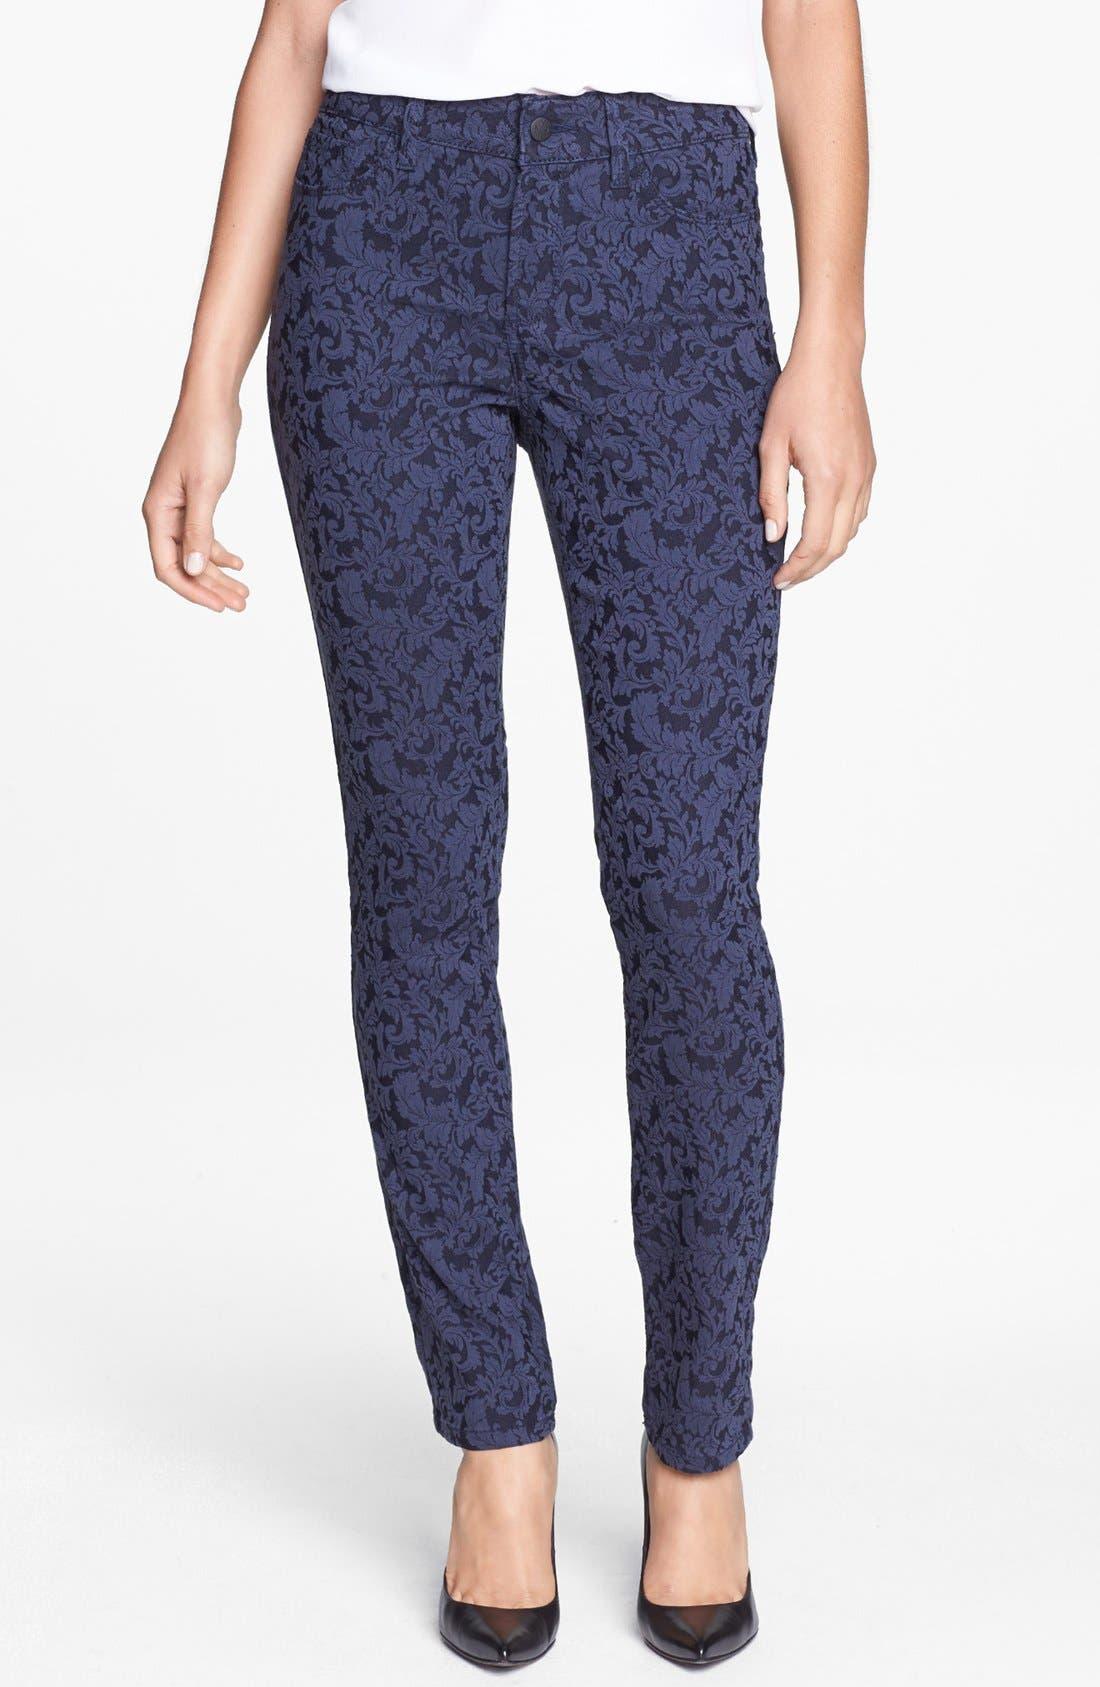 Main Image - NYDJ 'Jade' Patterned Stretch Skinny Jeans (Navy Jacquard)